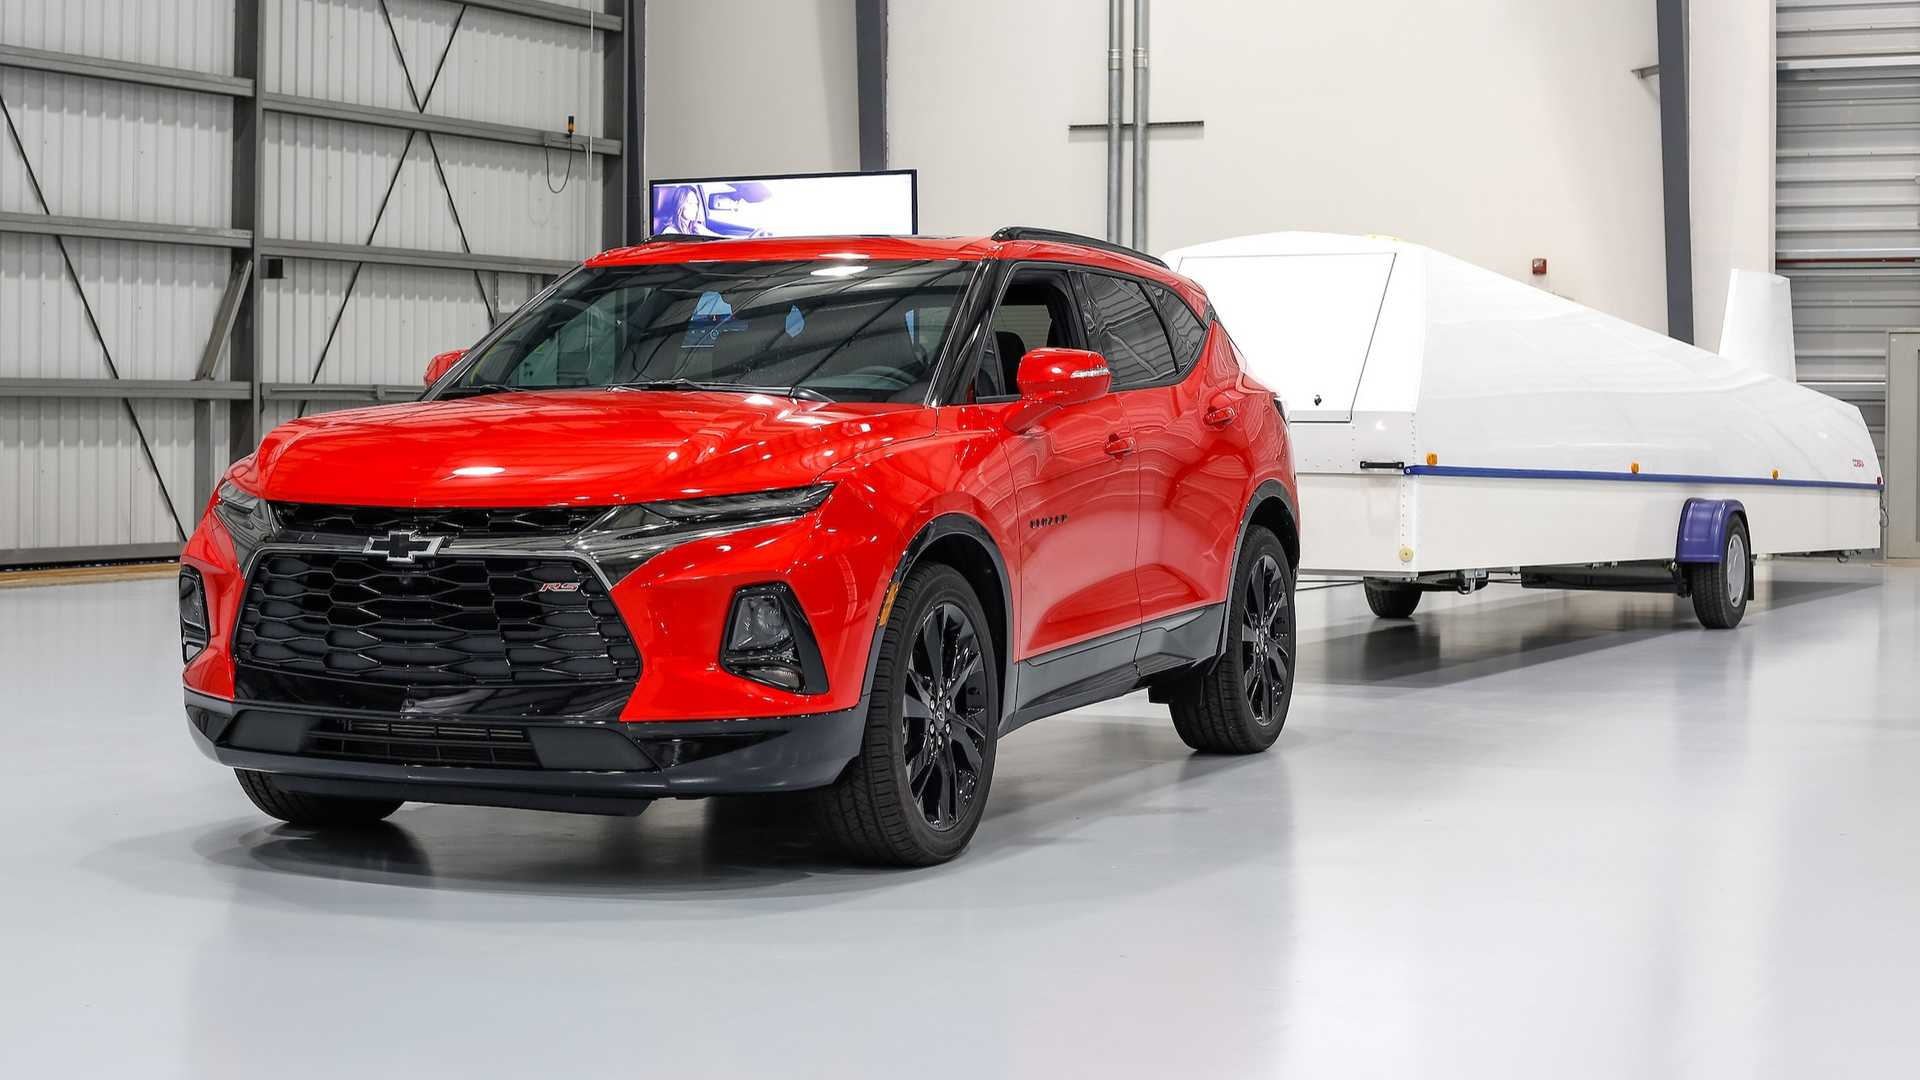 2019-chevrolet-blazer-first-drive-danh-gia-3.jpg